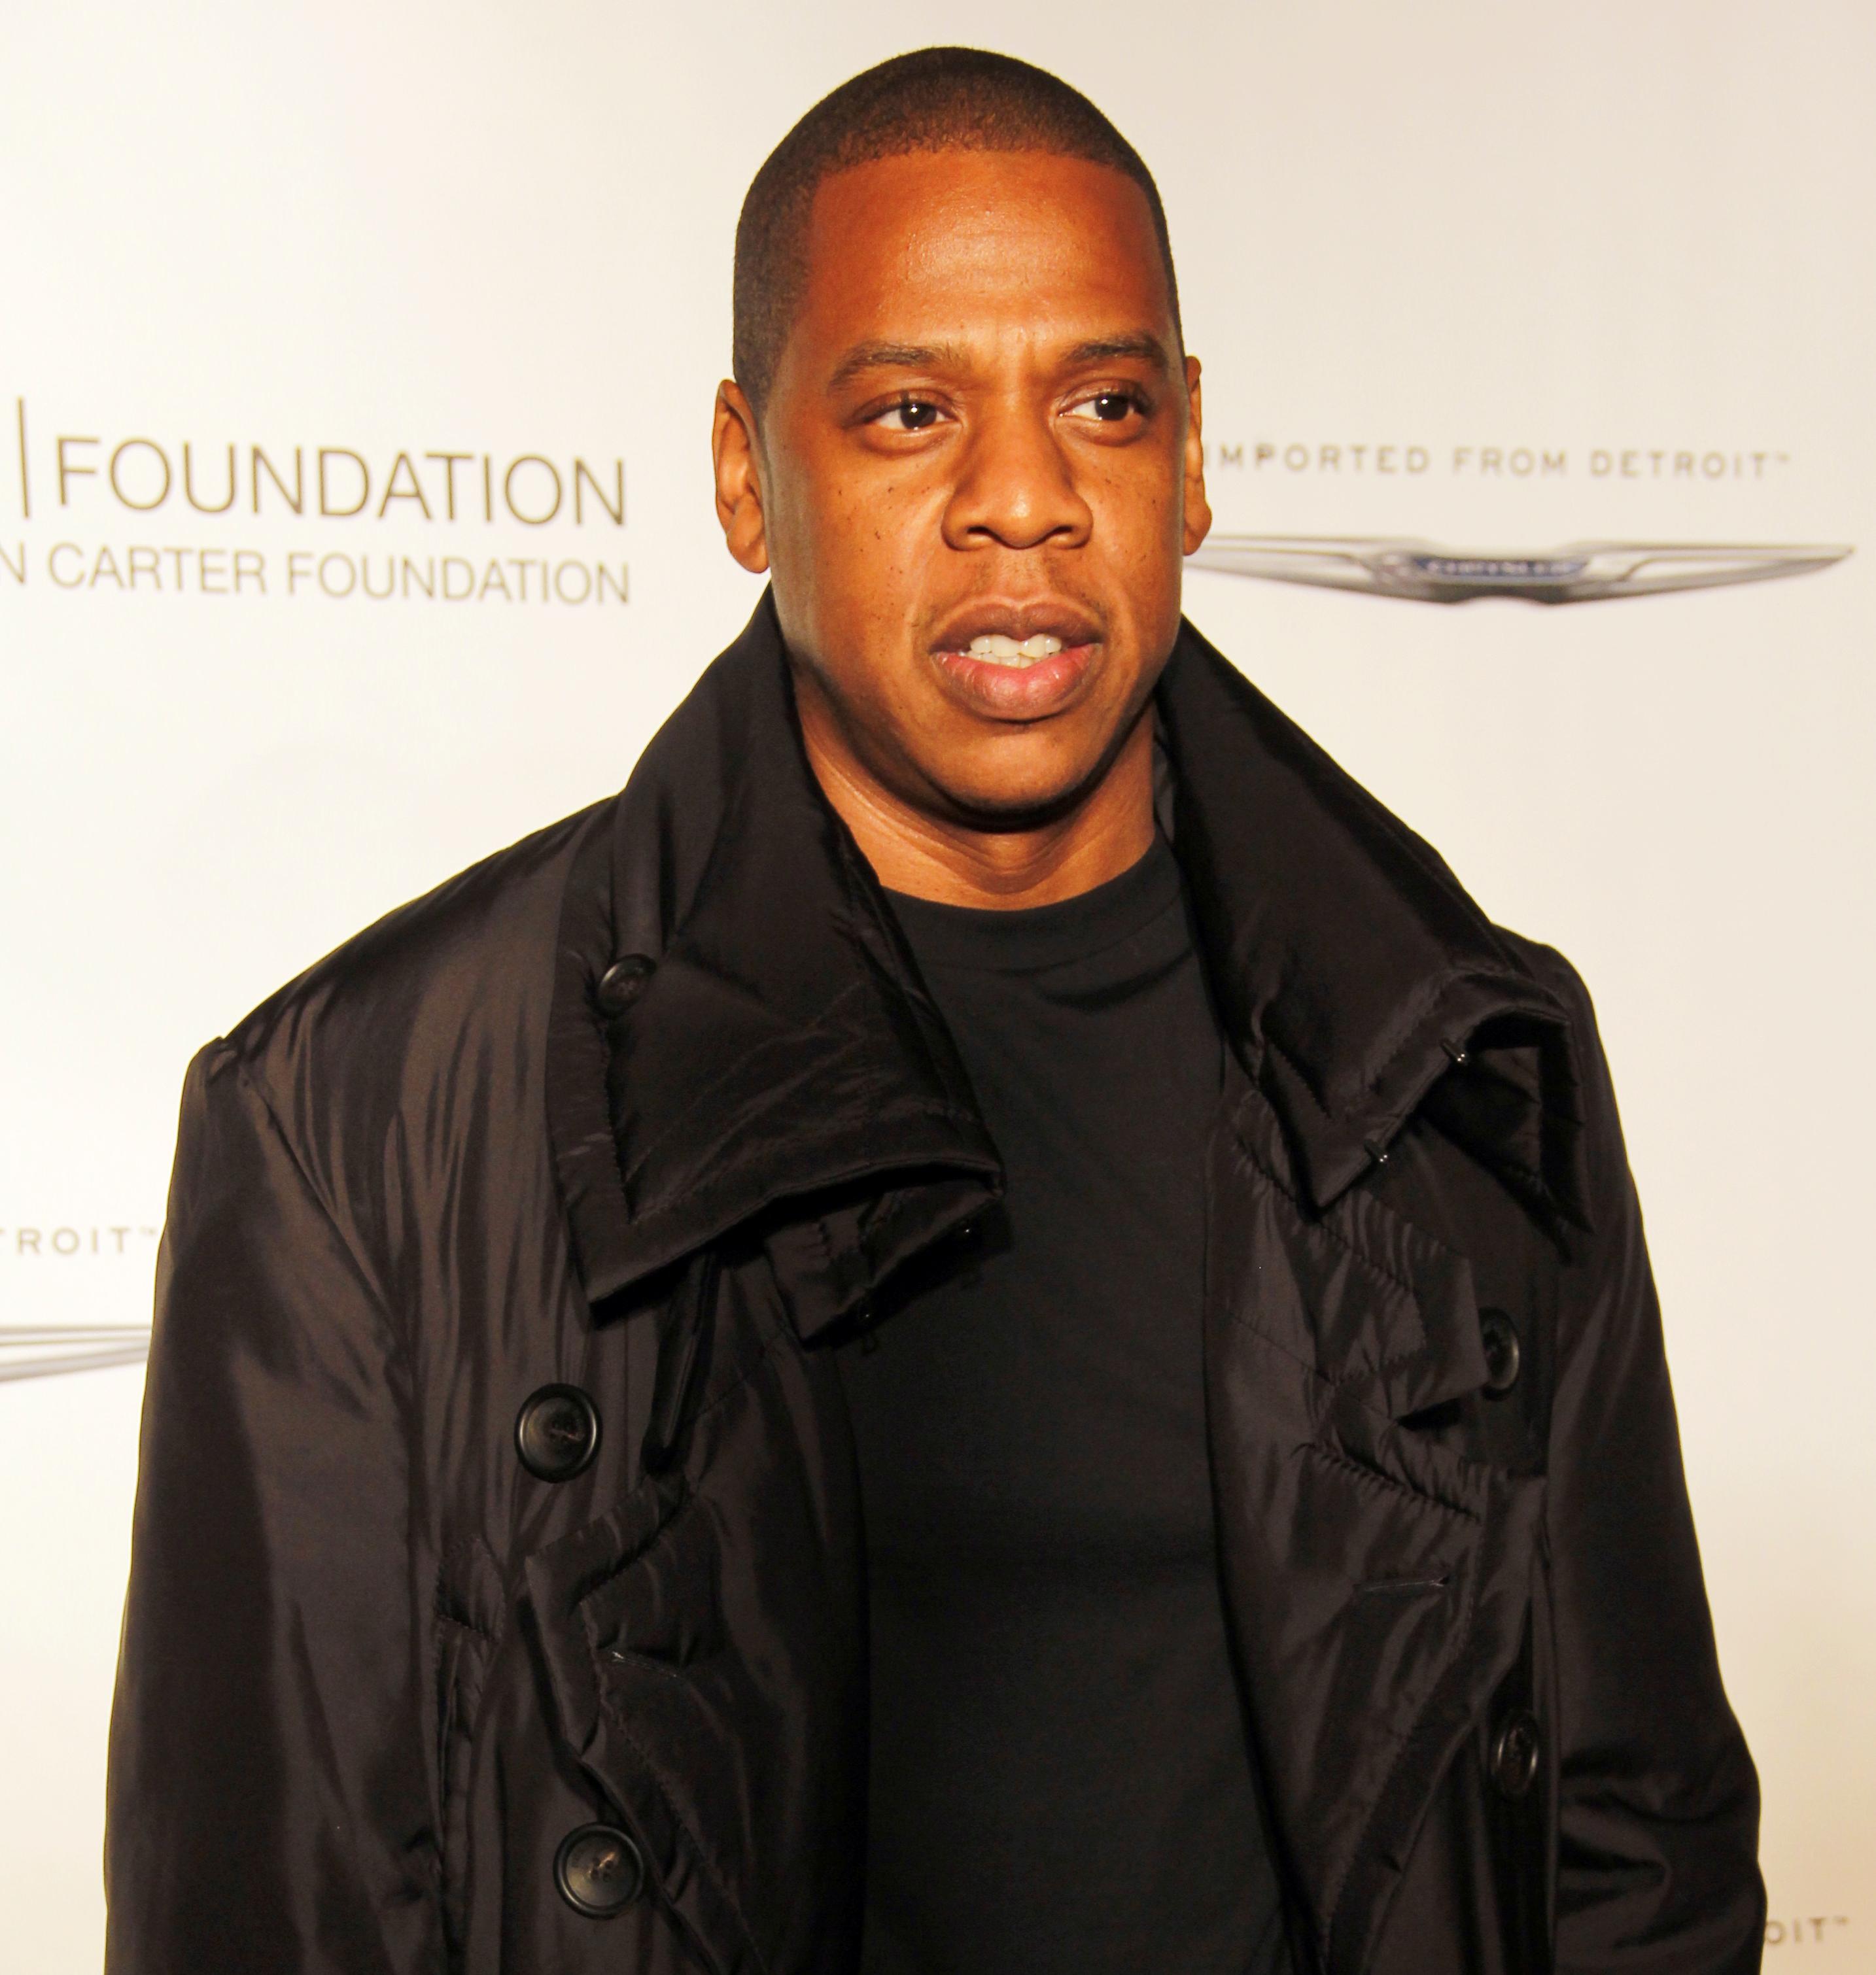 MBTI enneagram type of Jay Z